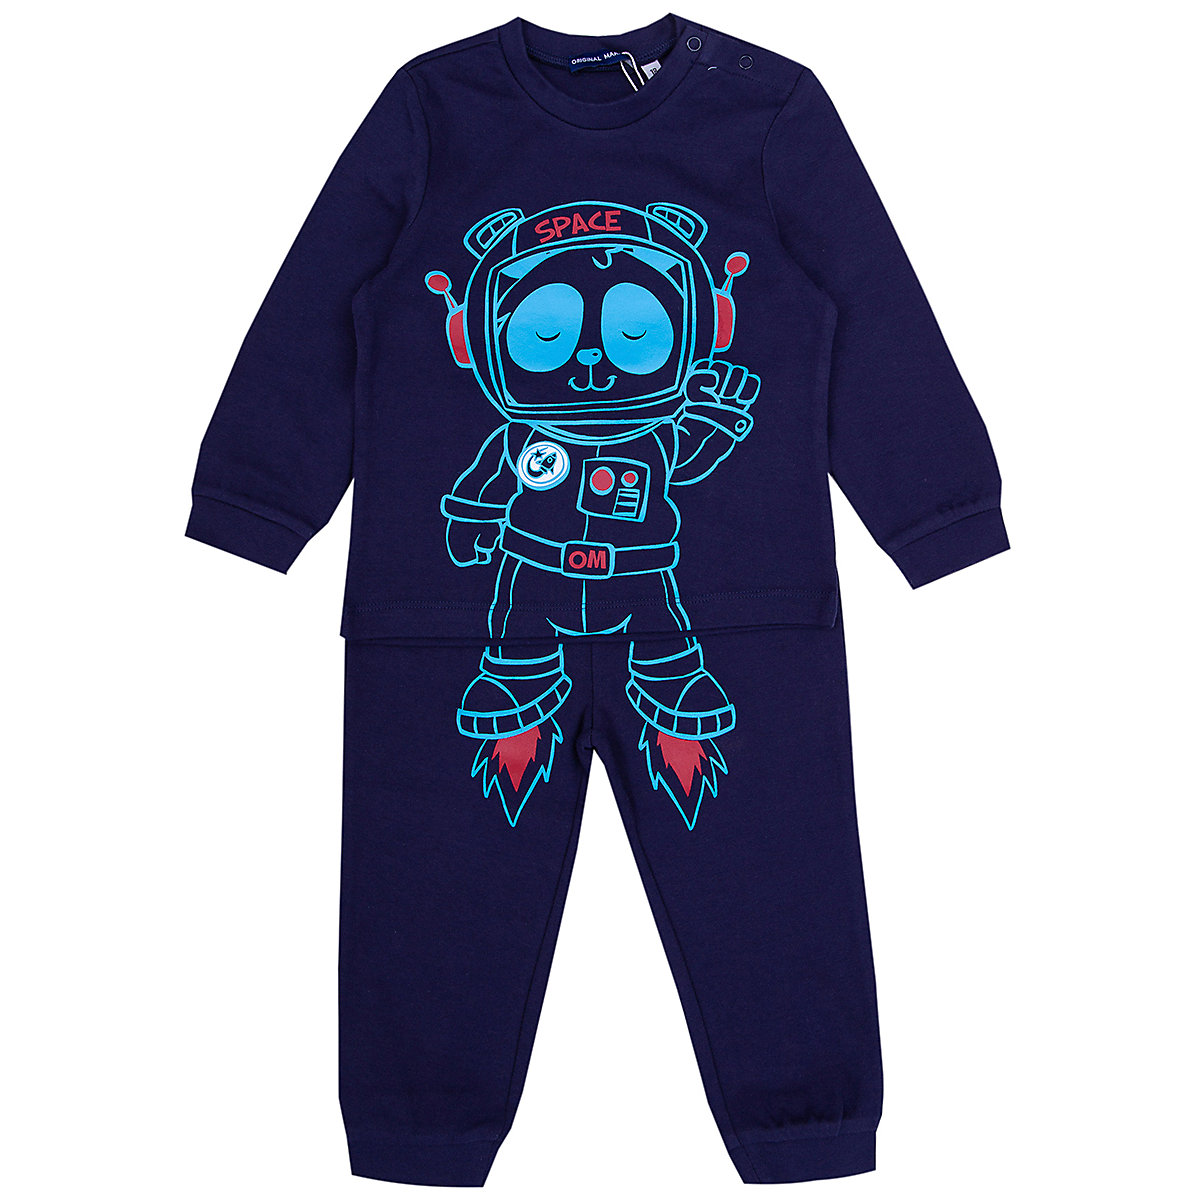 ORIGINAL MARINES Sleepwear & Robes 9501997 Cotton Baby Boys Clothing Pajamas MTpromo